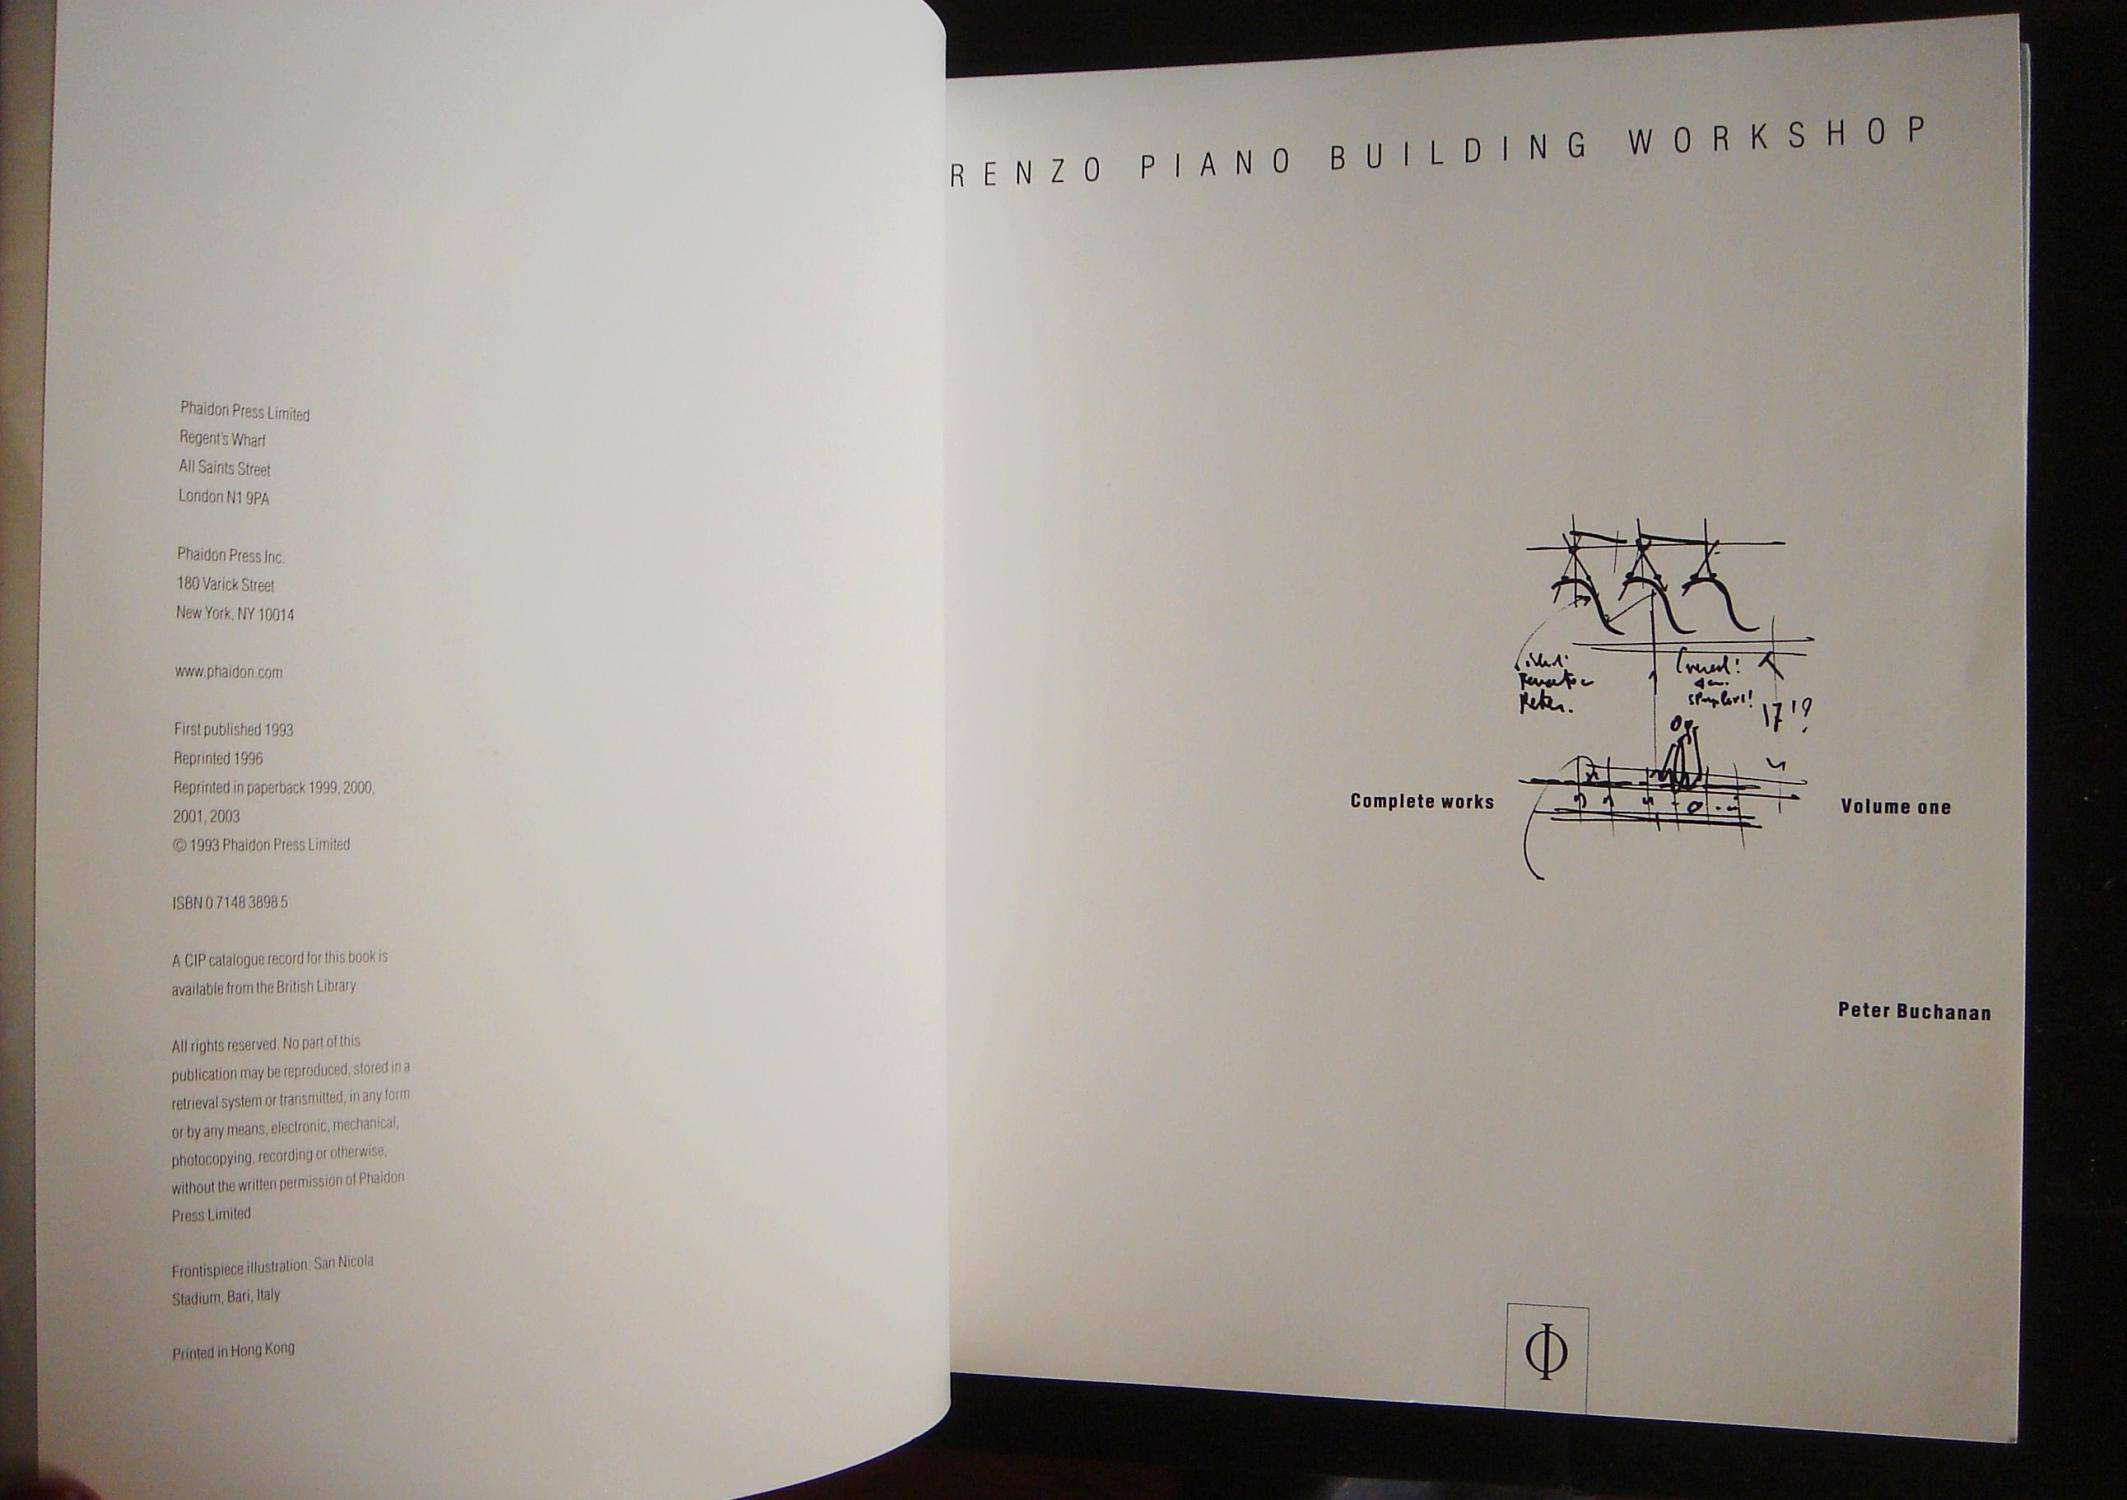 Renzo Piano Building Workshop: Complete